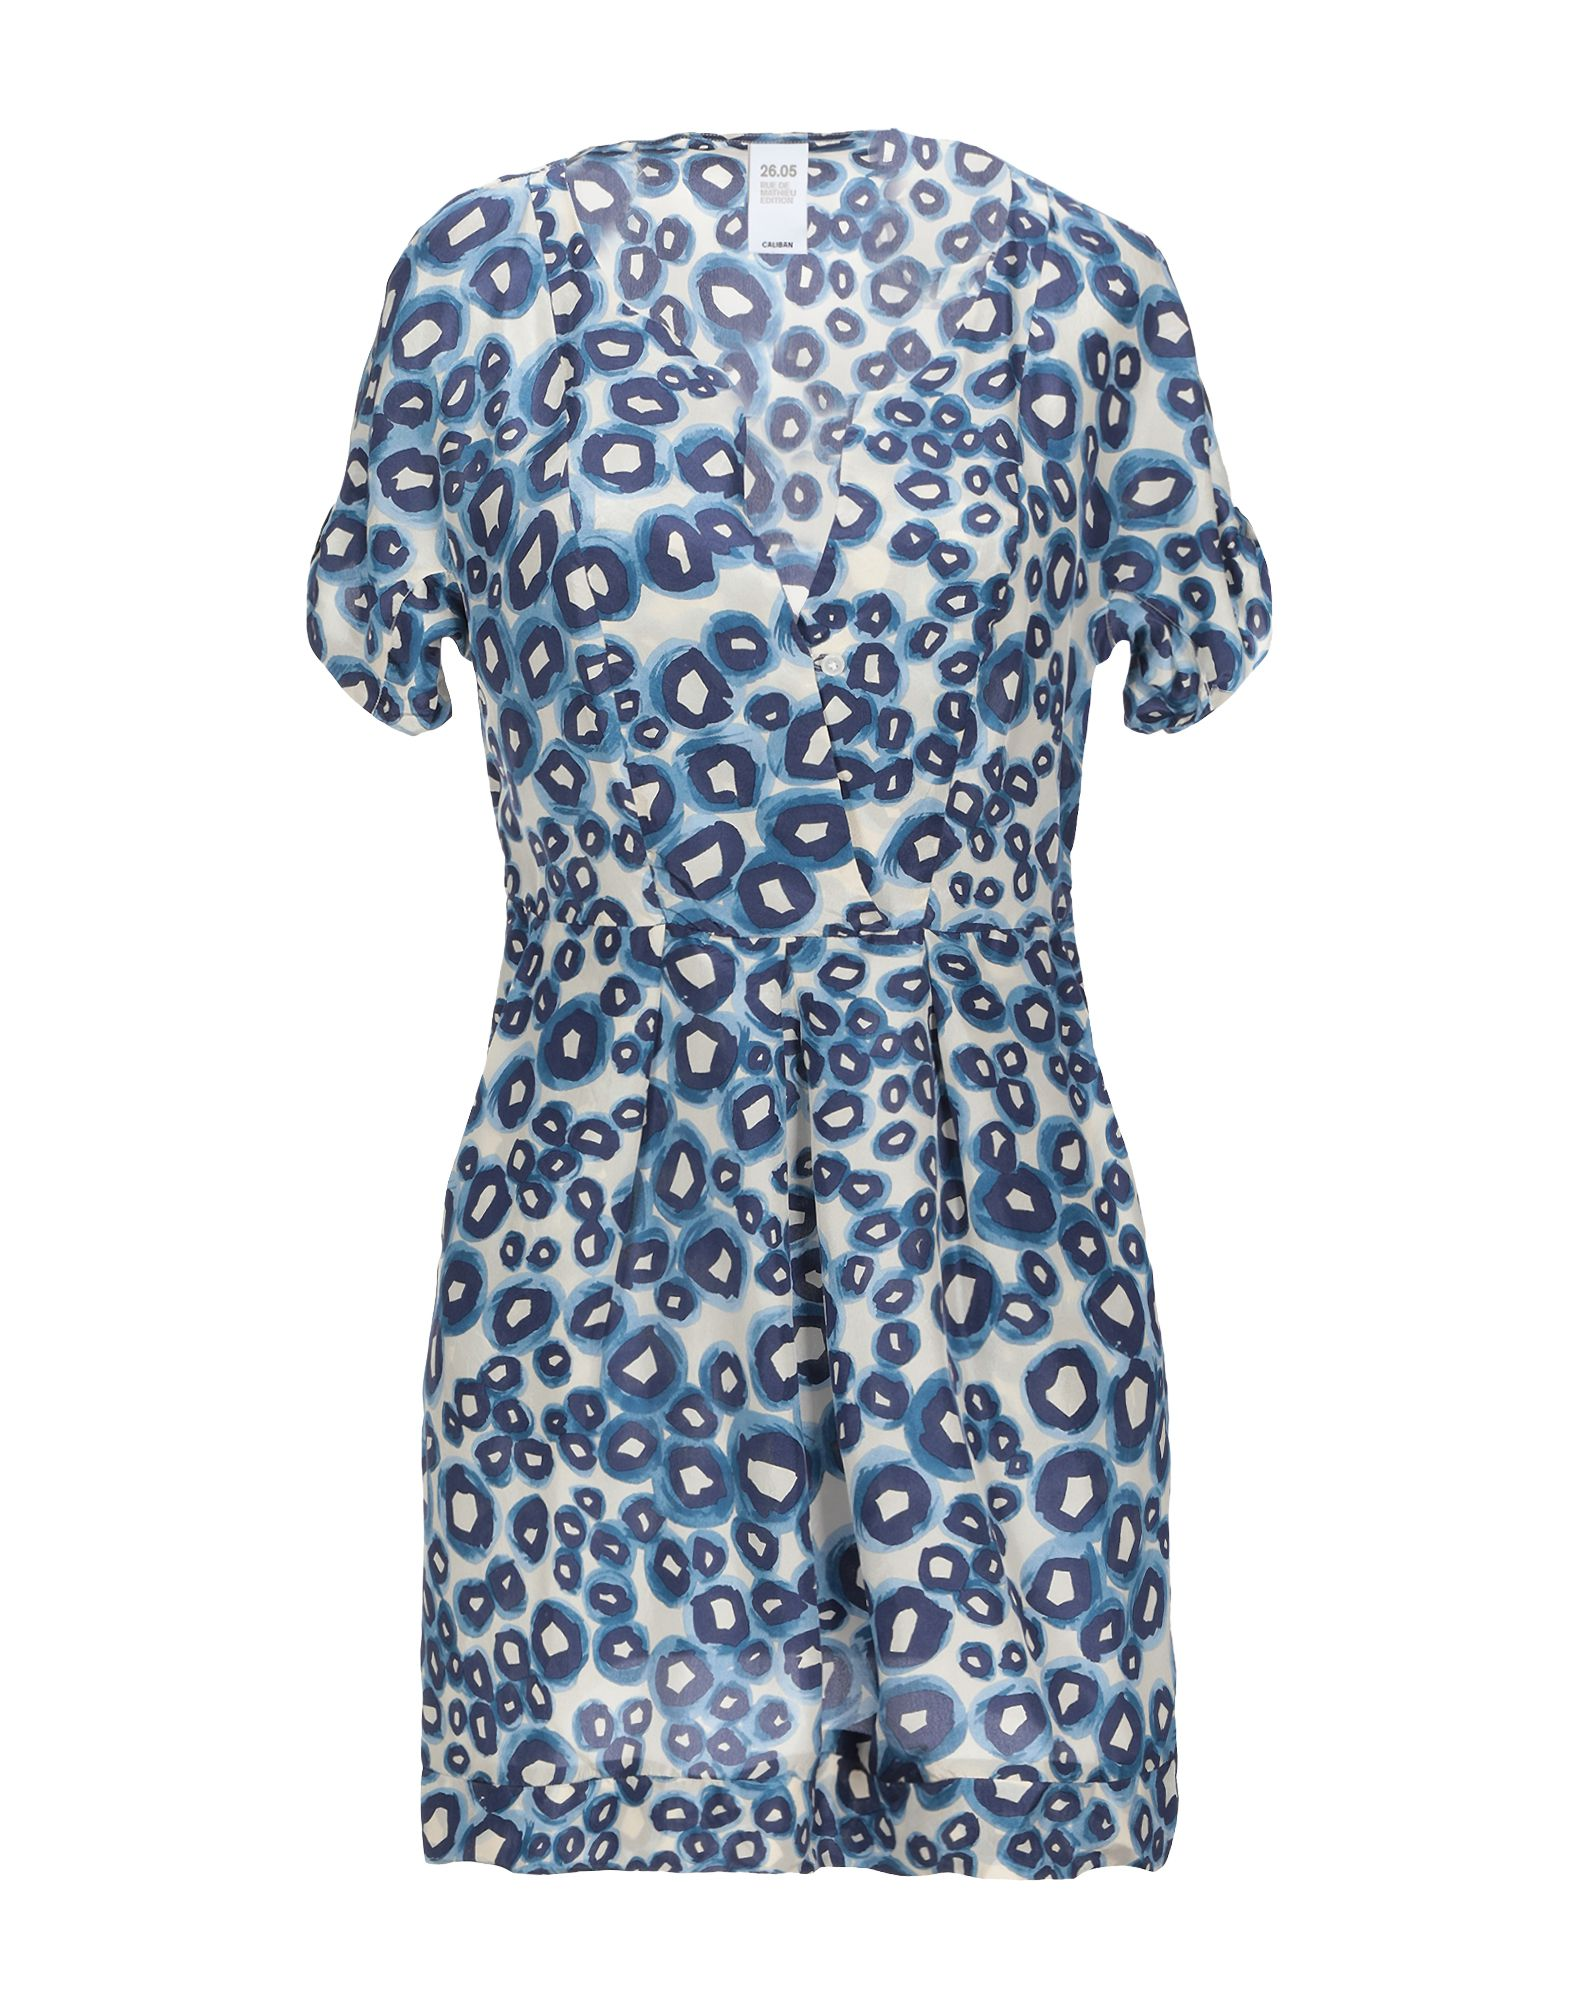 CALIBAN RUE DE MATHIEU EDITION Короткое платье